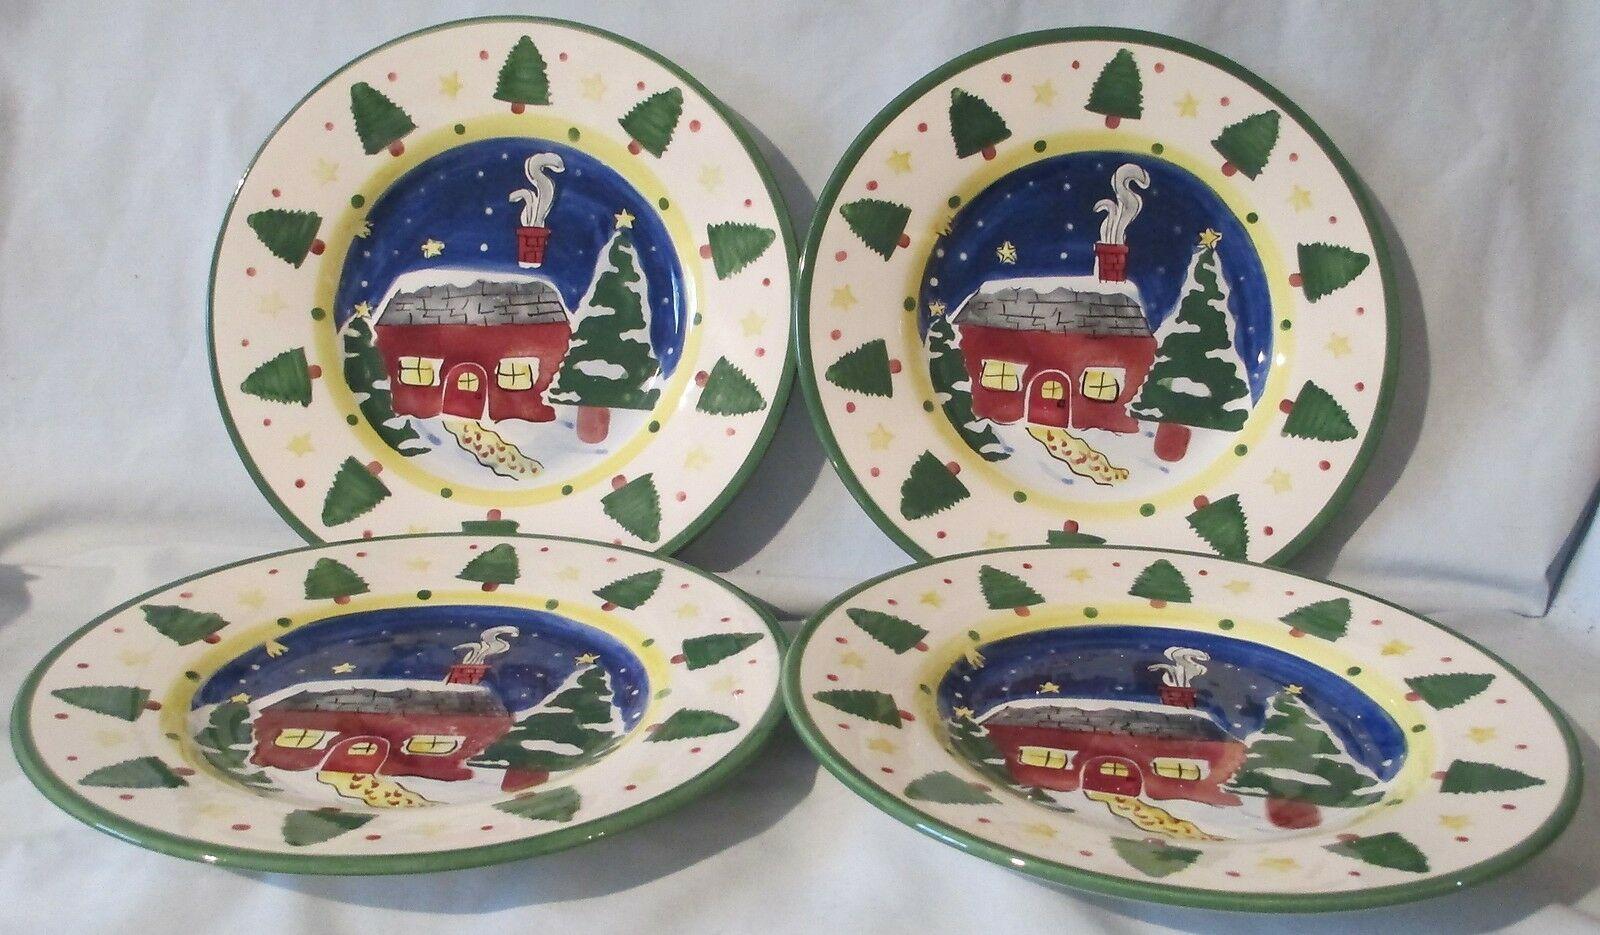 Insprado IDC Christmas Cabin Salad Plate set of 4